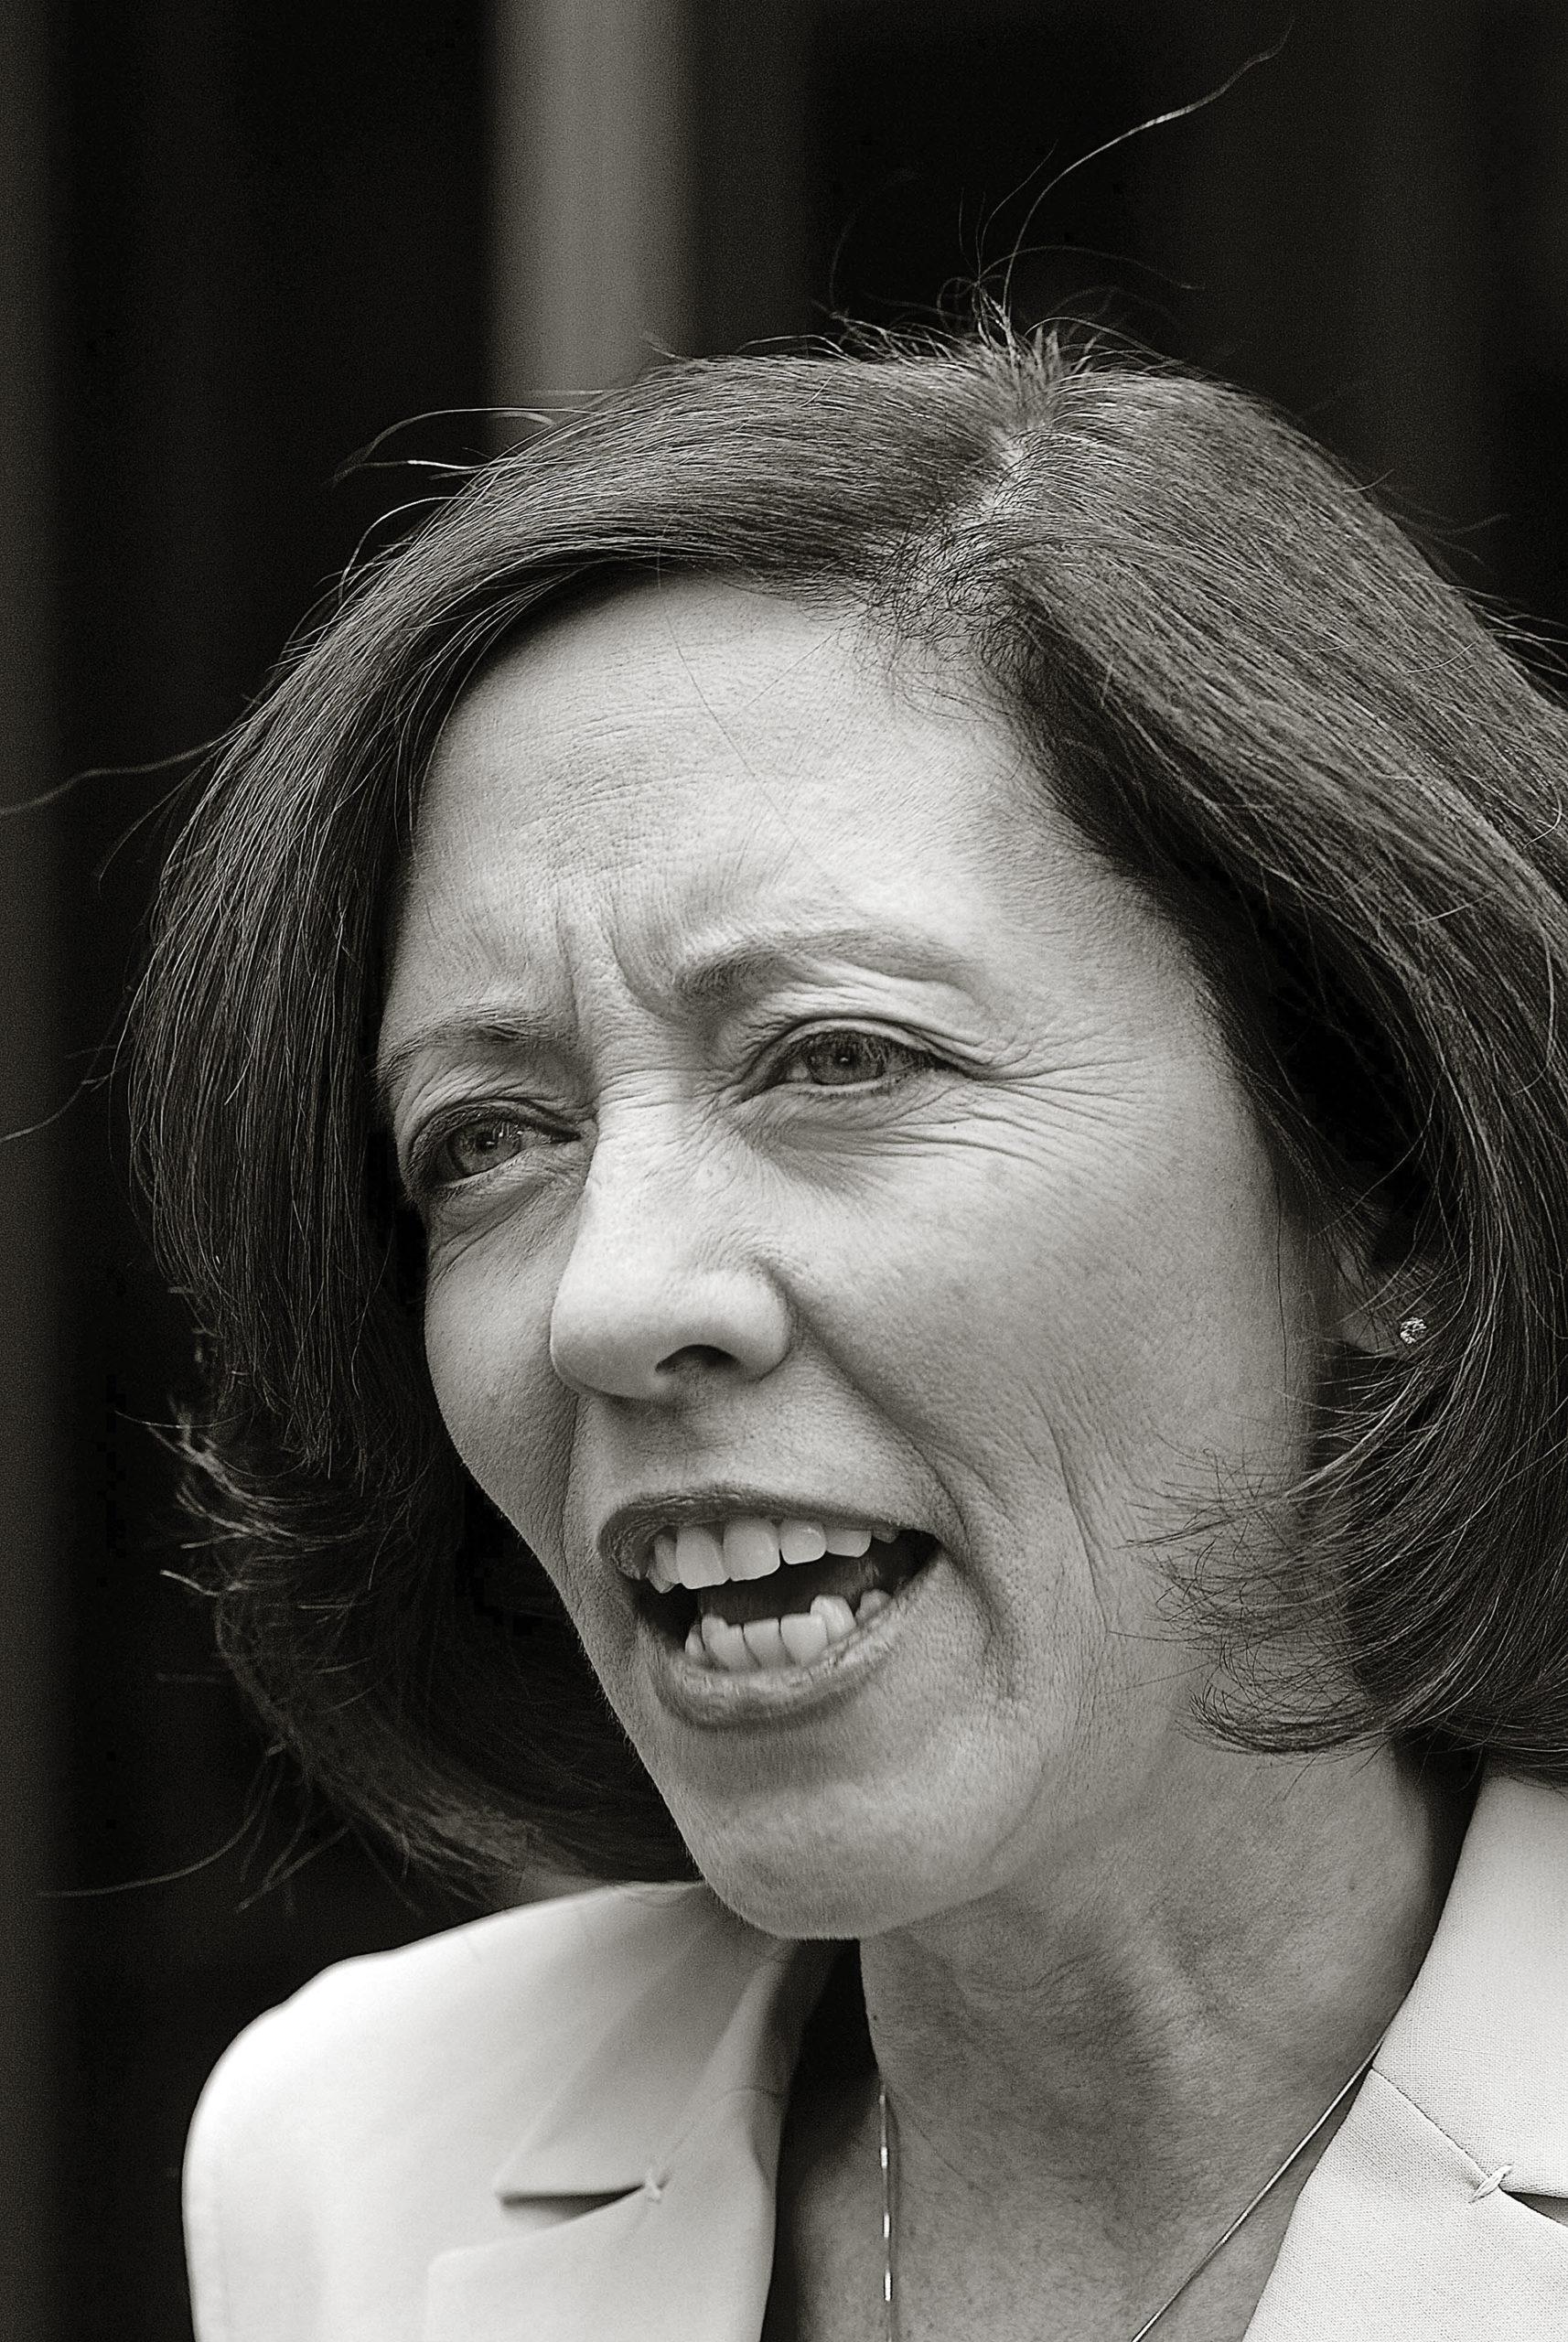 Junior United States  Senator from Washington, Maria Cantwell